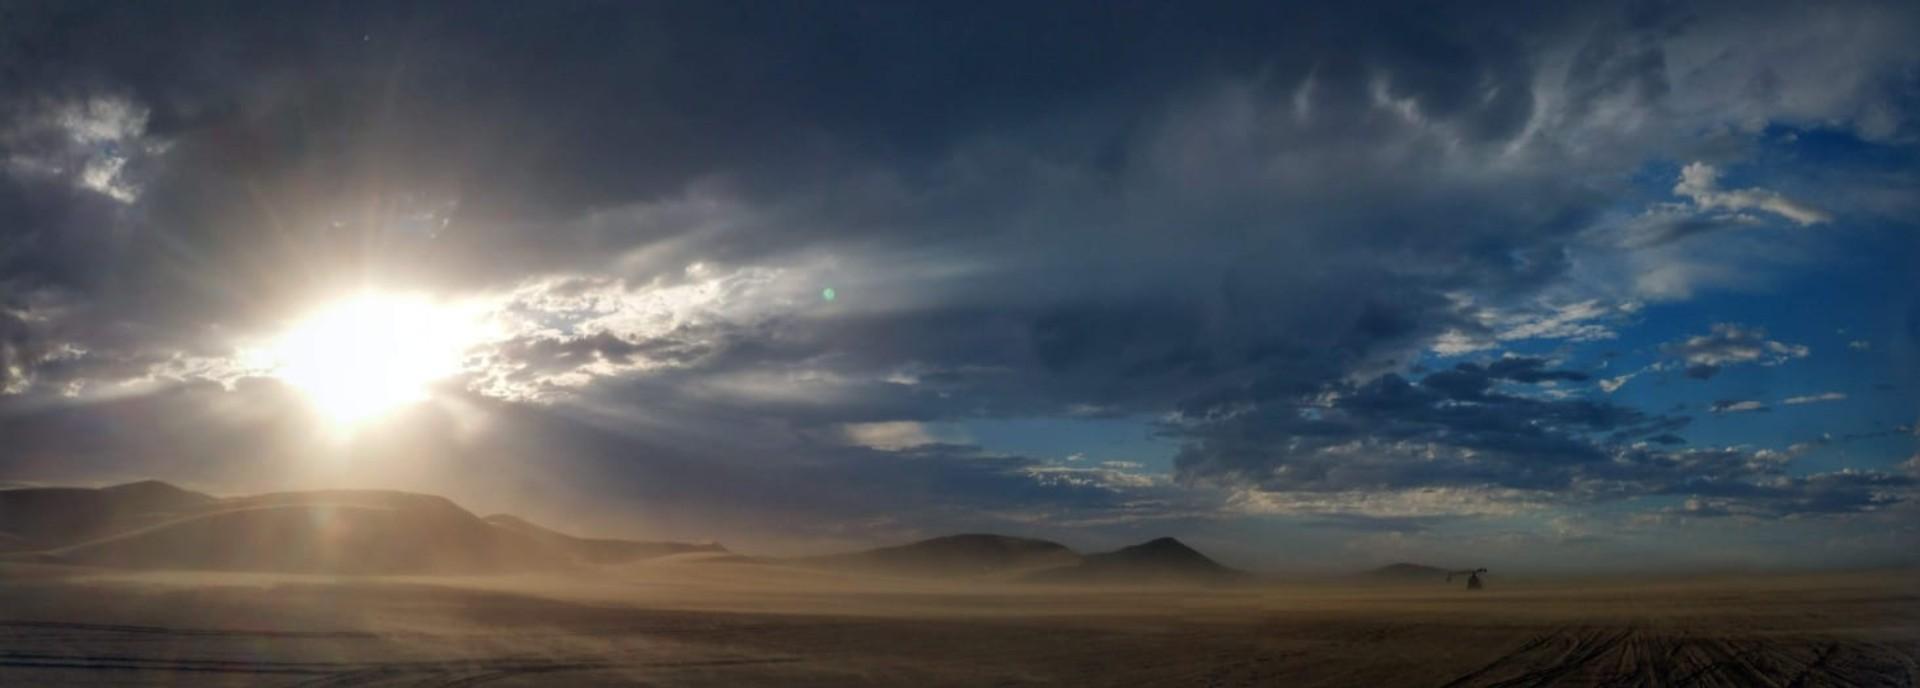 Namibia (Between Swakopmund & Walvisbaai.jpg